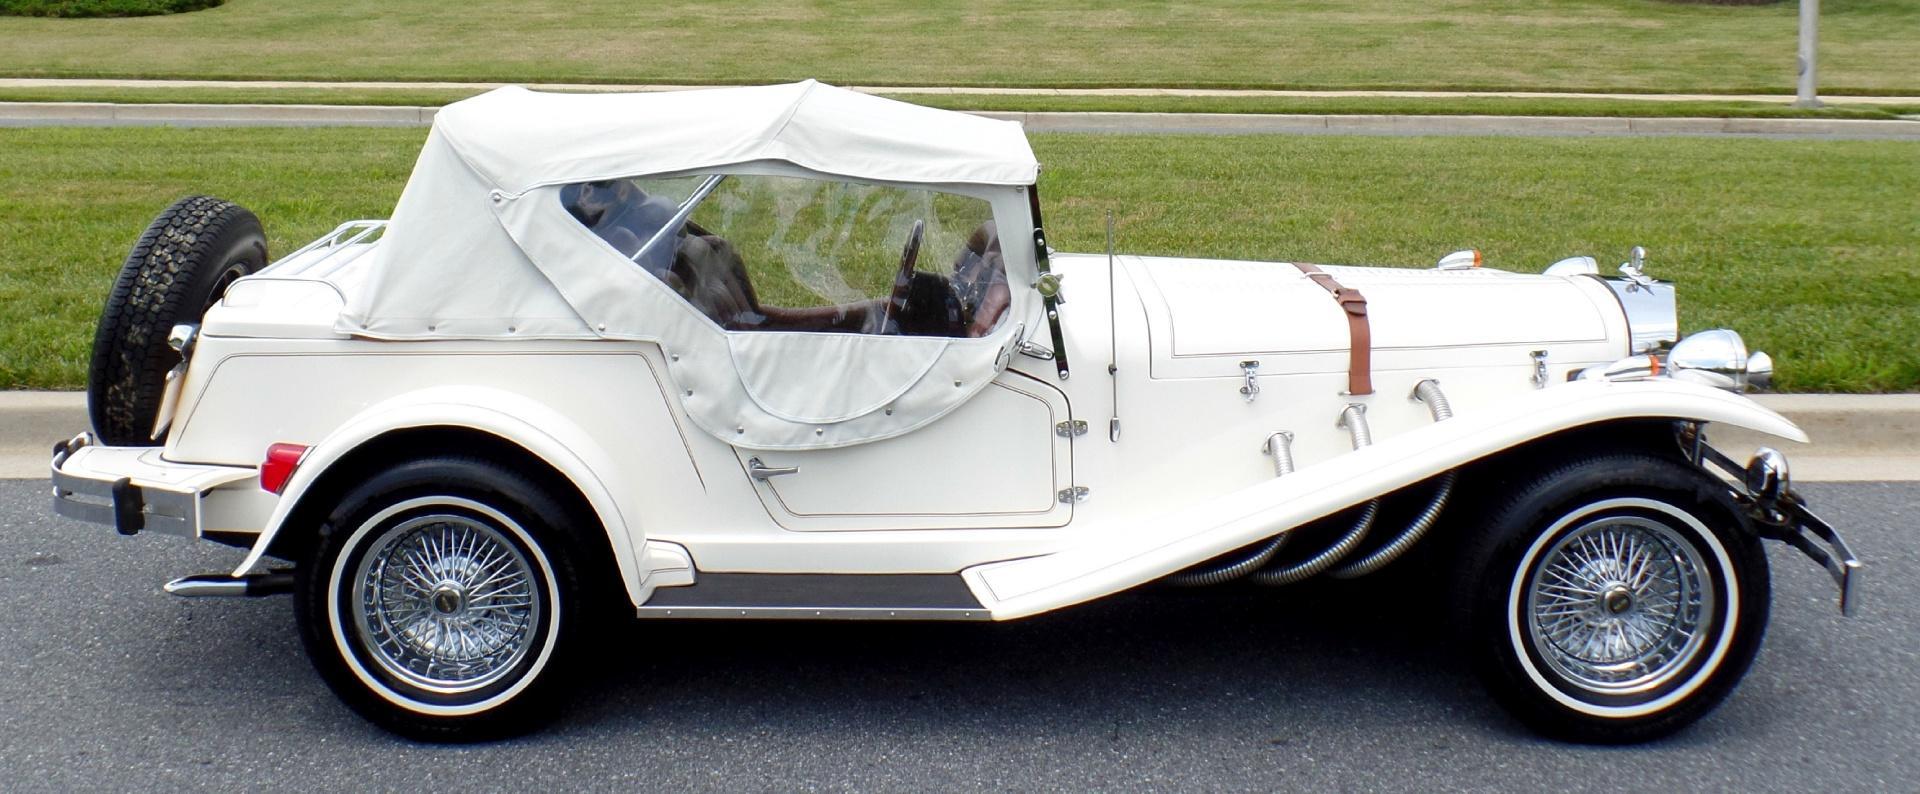 1929 Mercedes-Benz SSK Replica Roadster